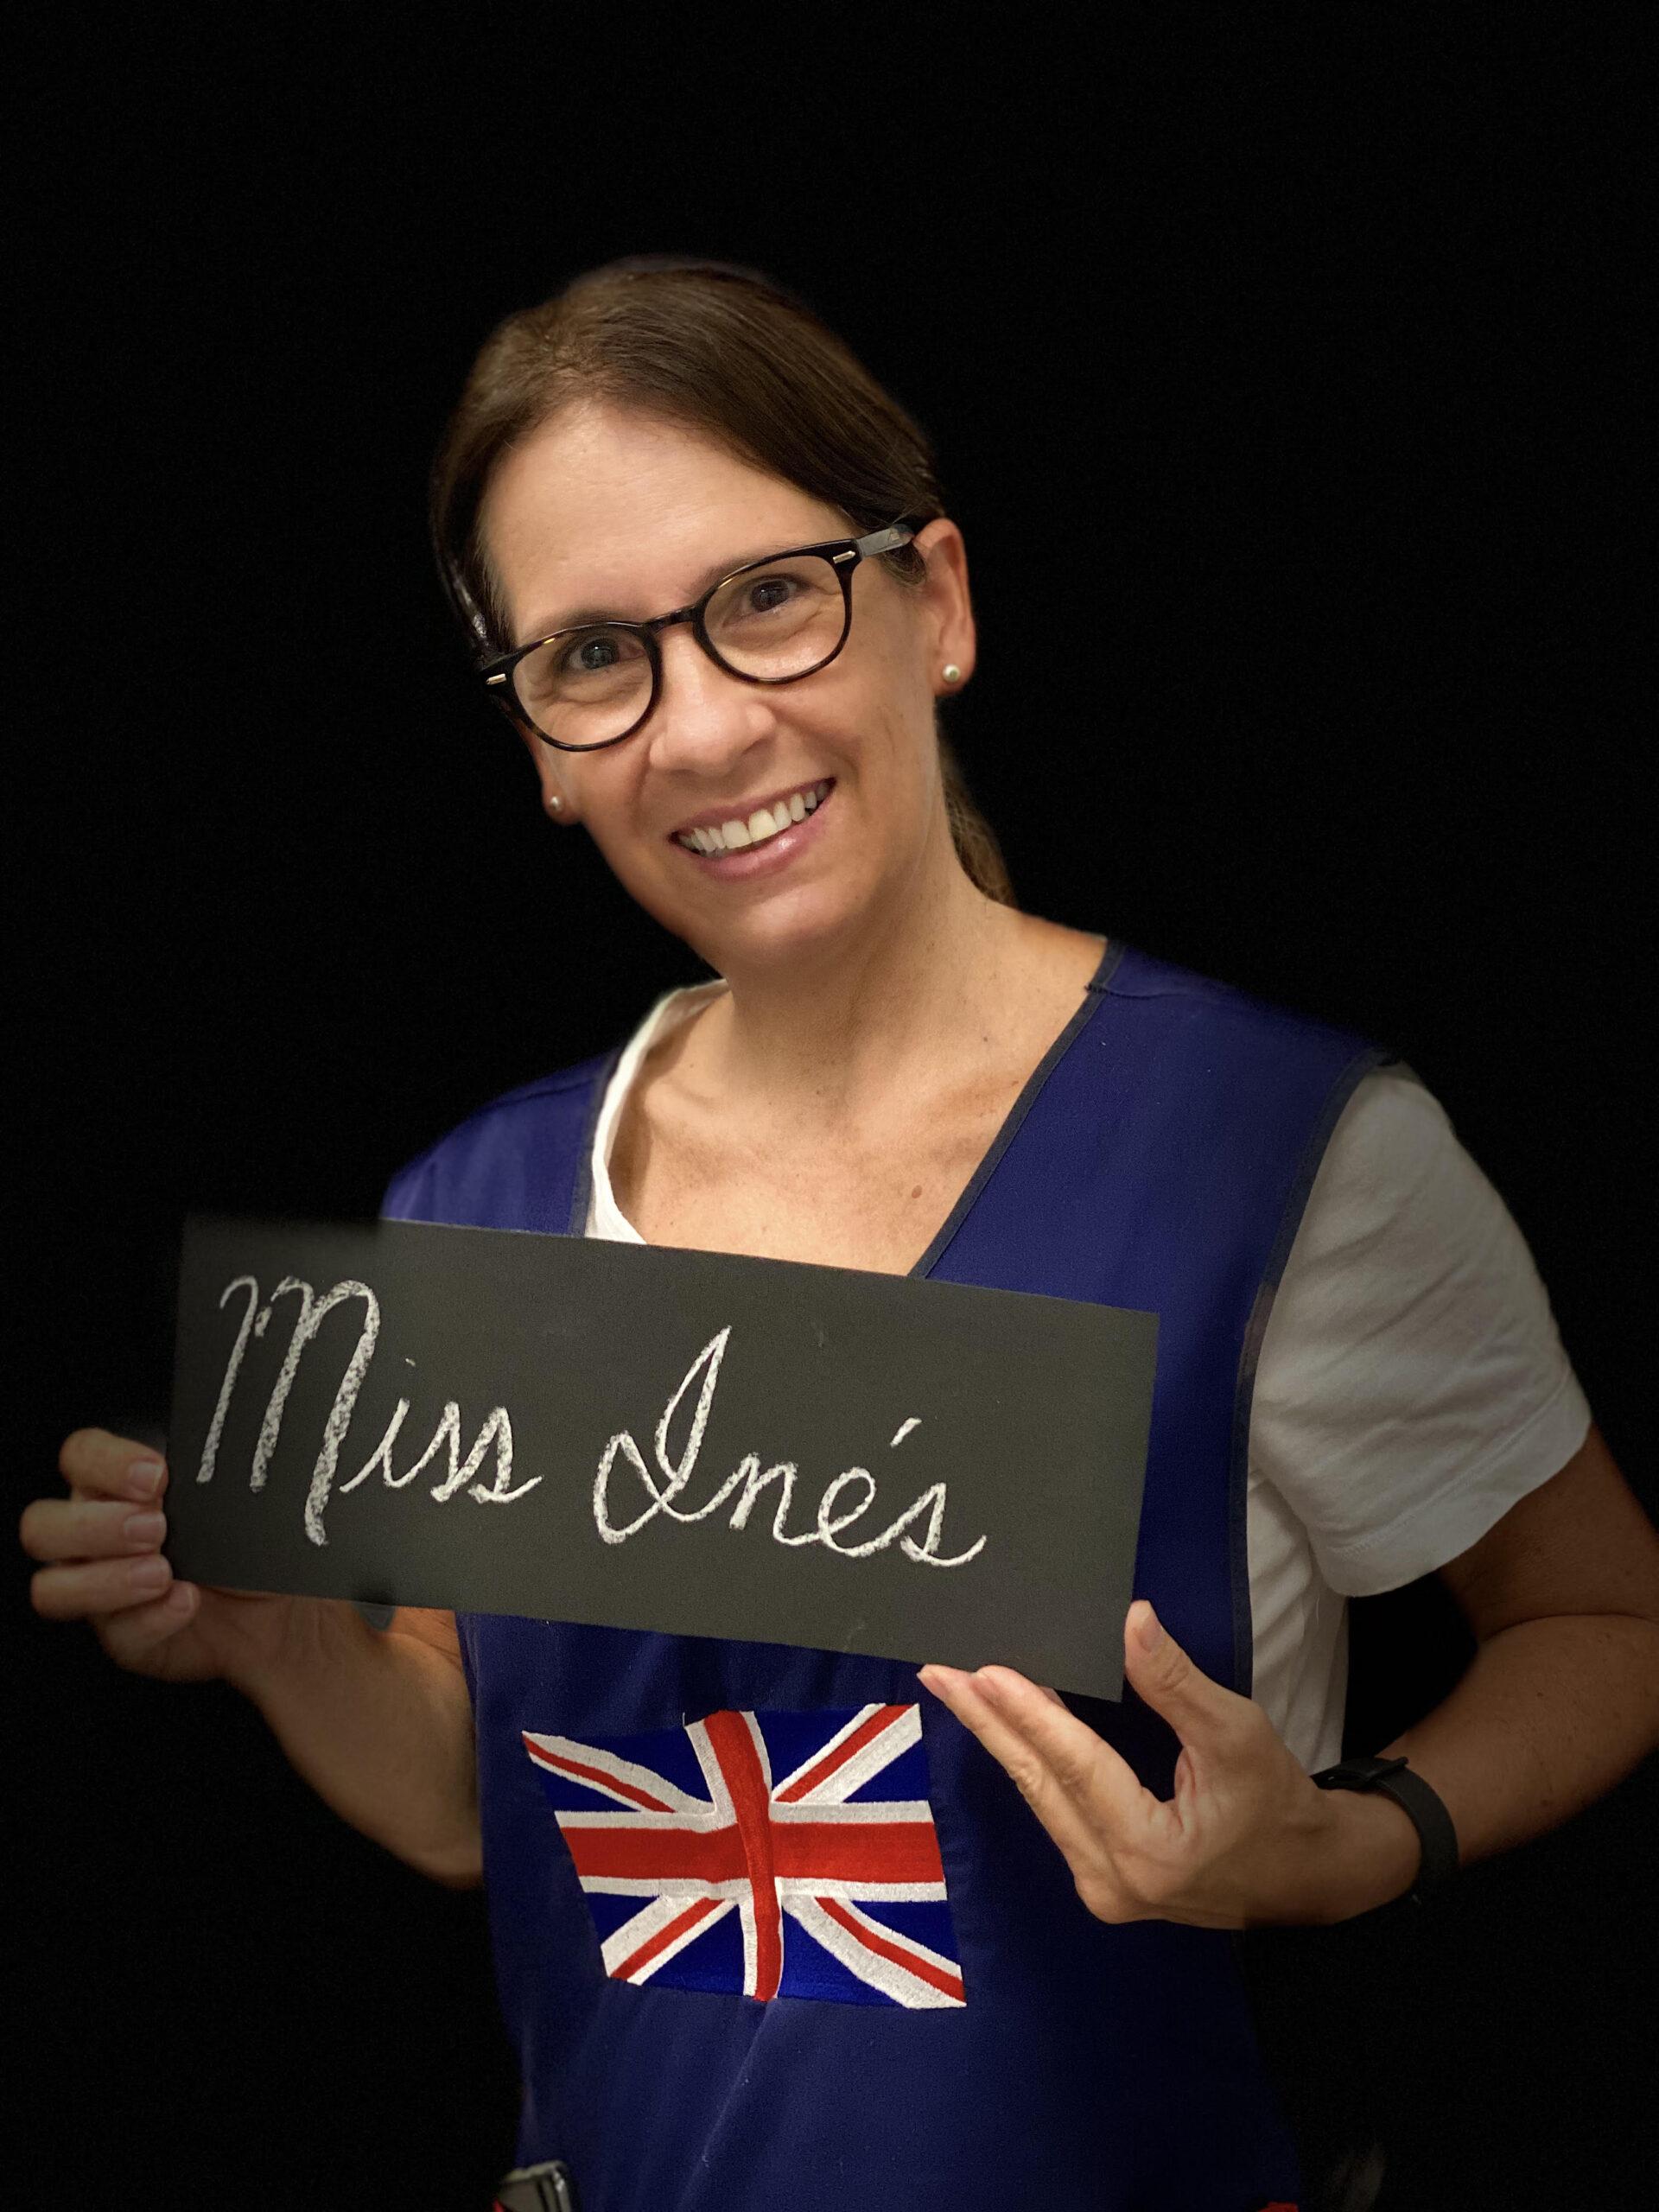 Miss Ines